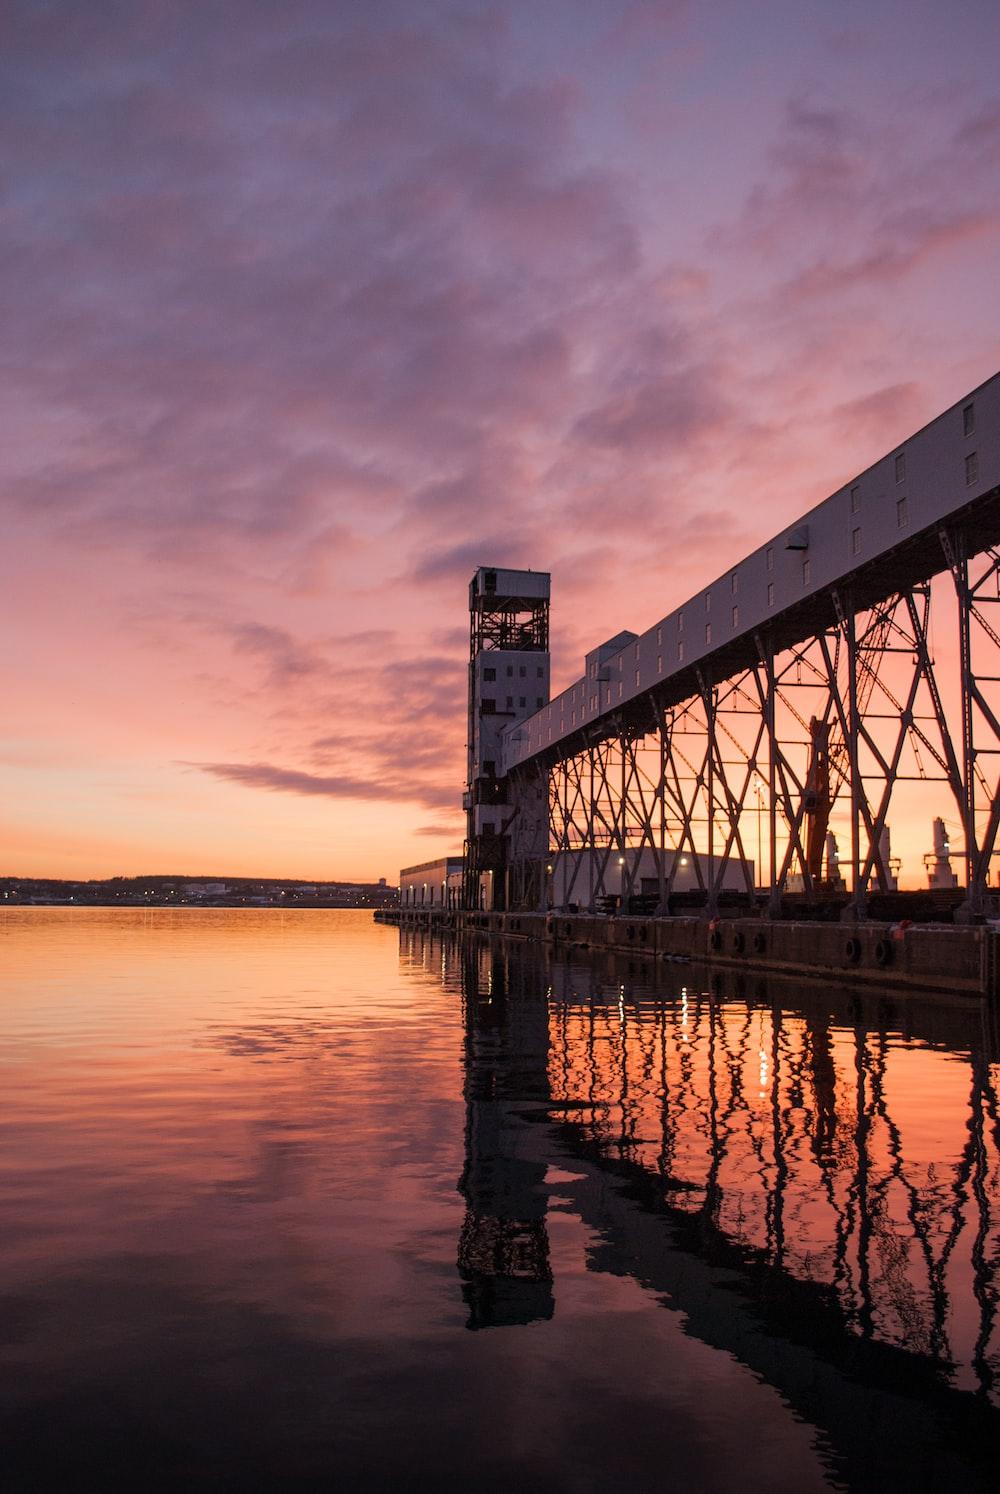 grey bridge on body of water